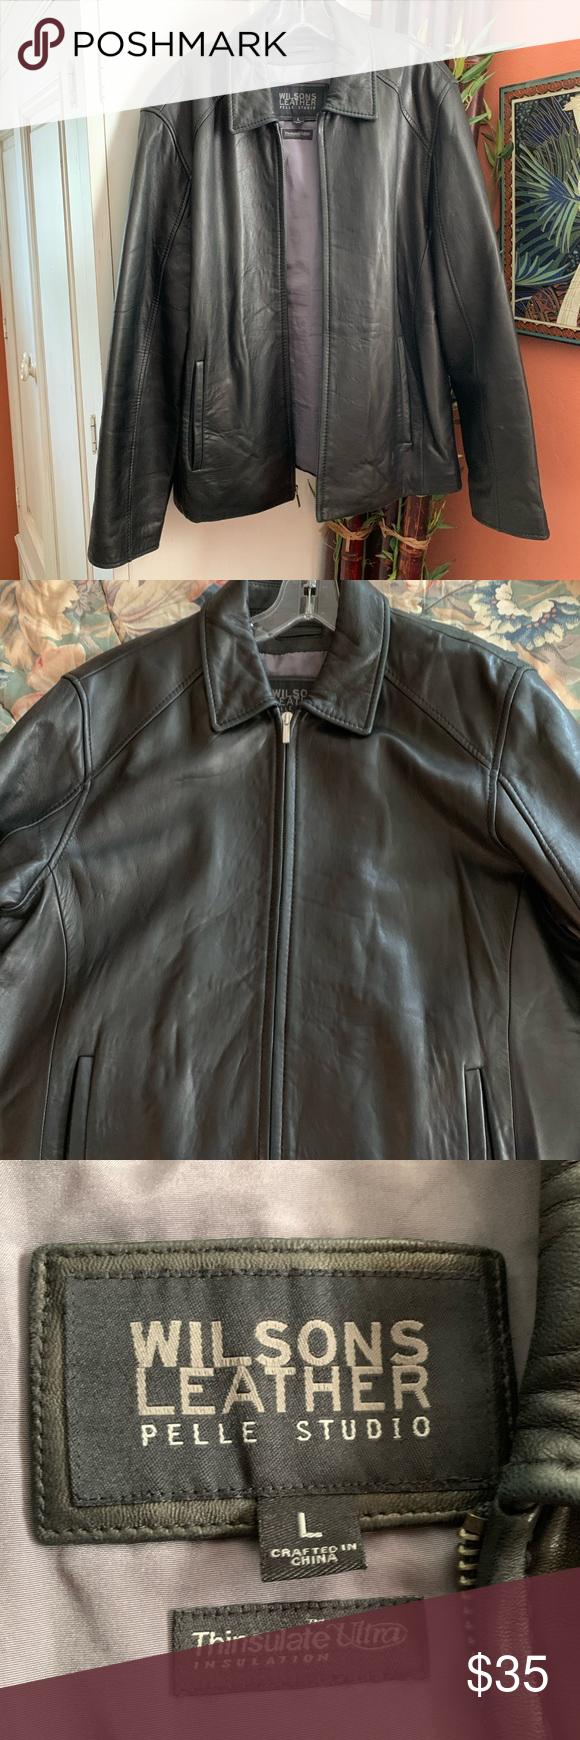 Wilsons leather Pelle studio men's leather jacket